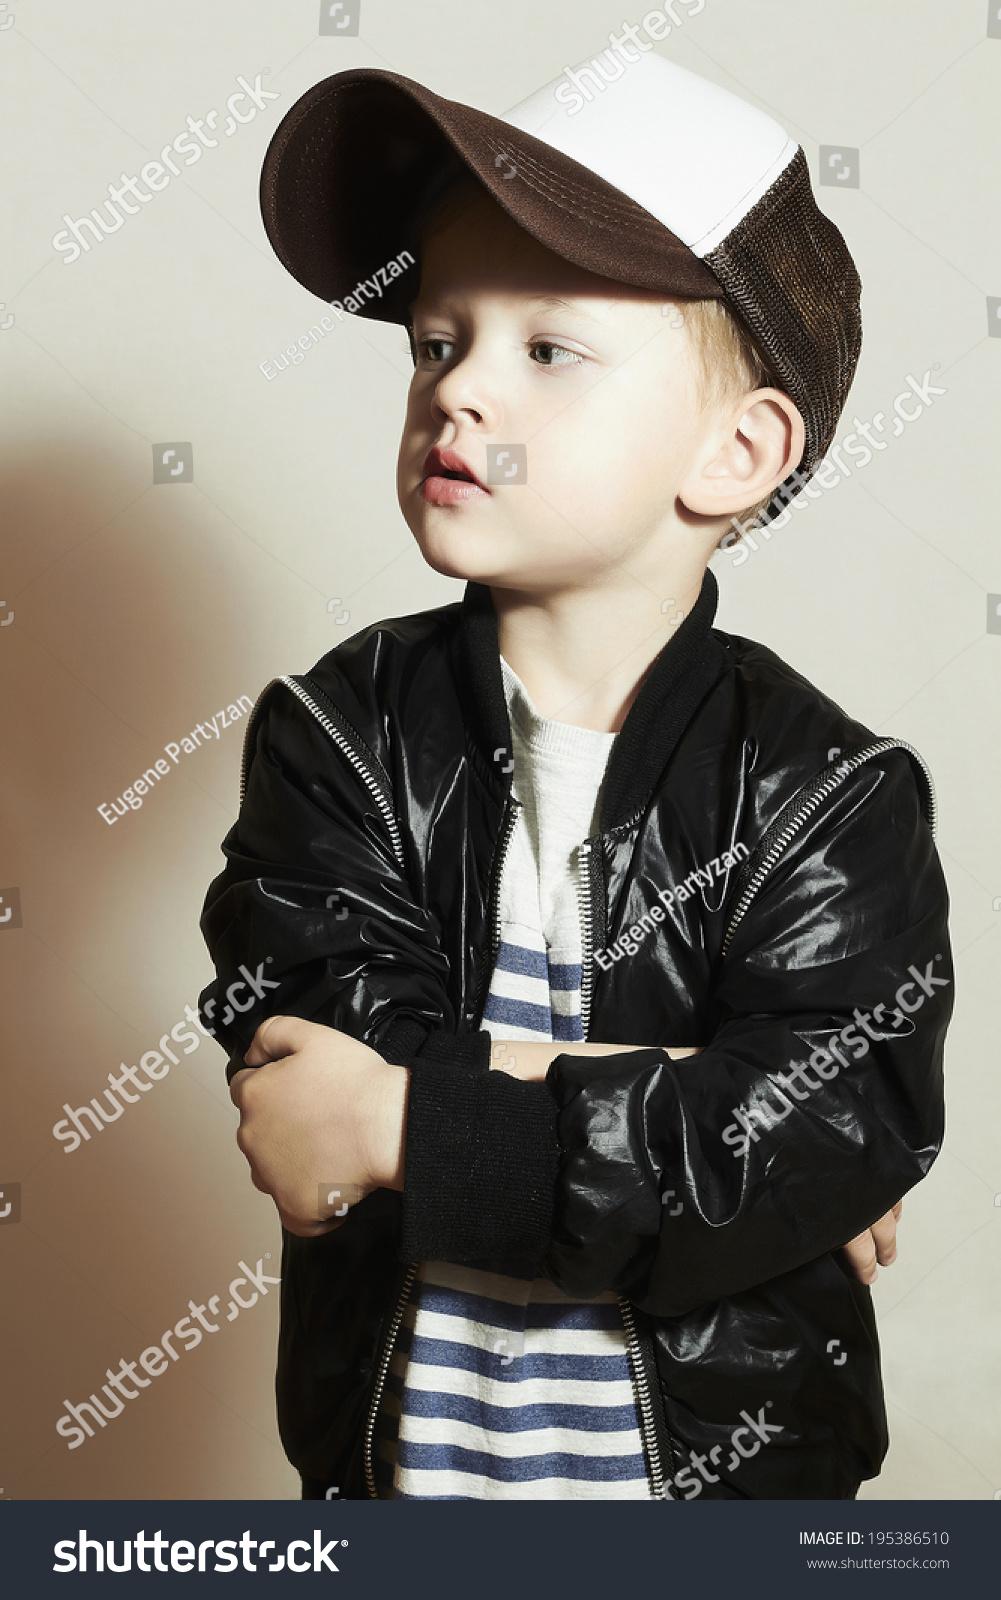 Fashionable Little Boy Hip Hop Style Fashion Children Handsome Blond Kid With Big Blue Eyes